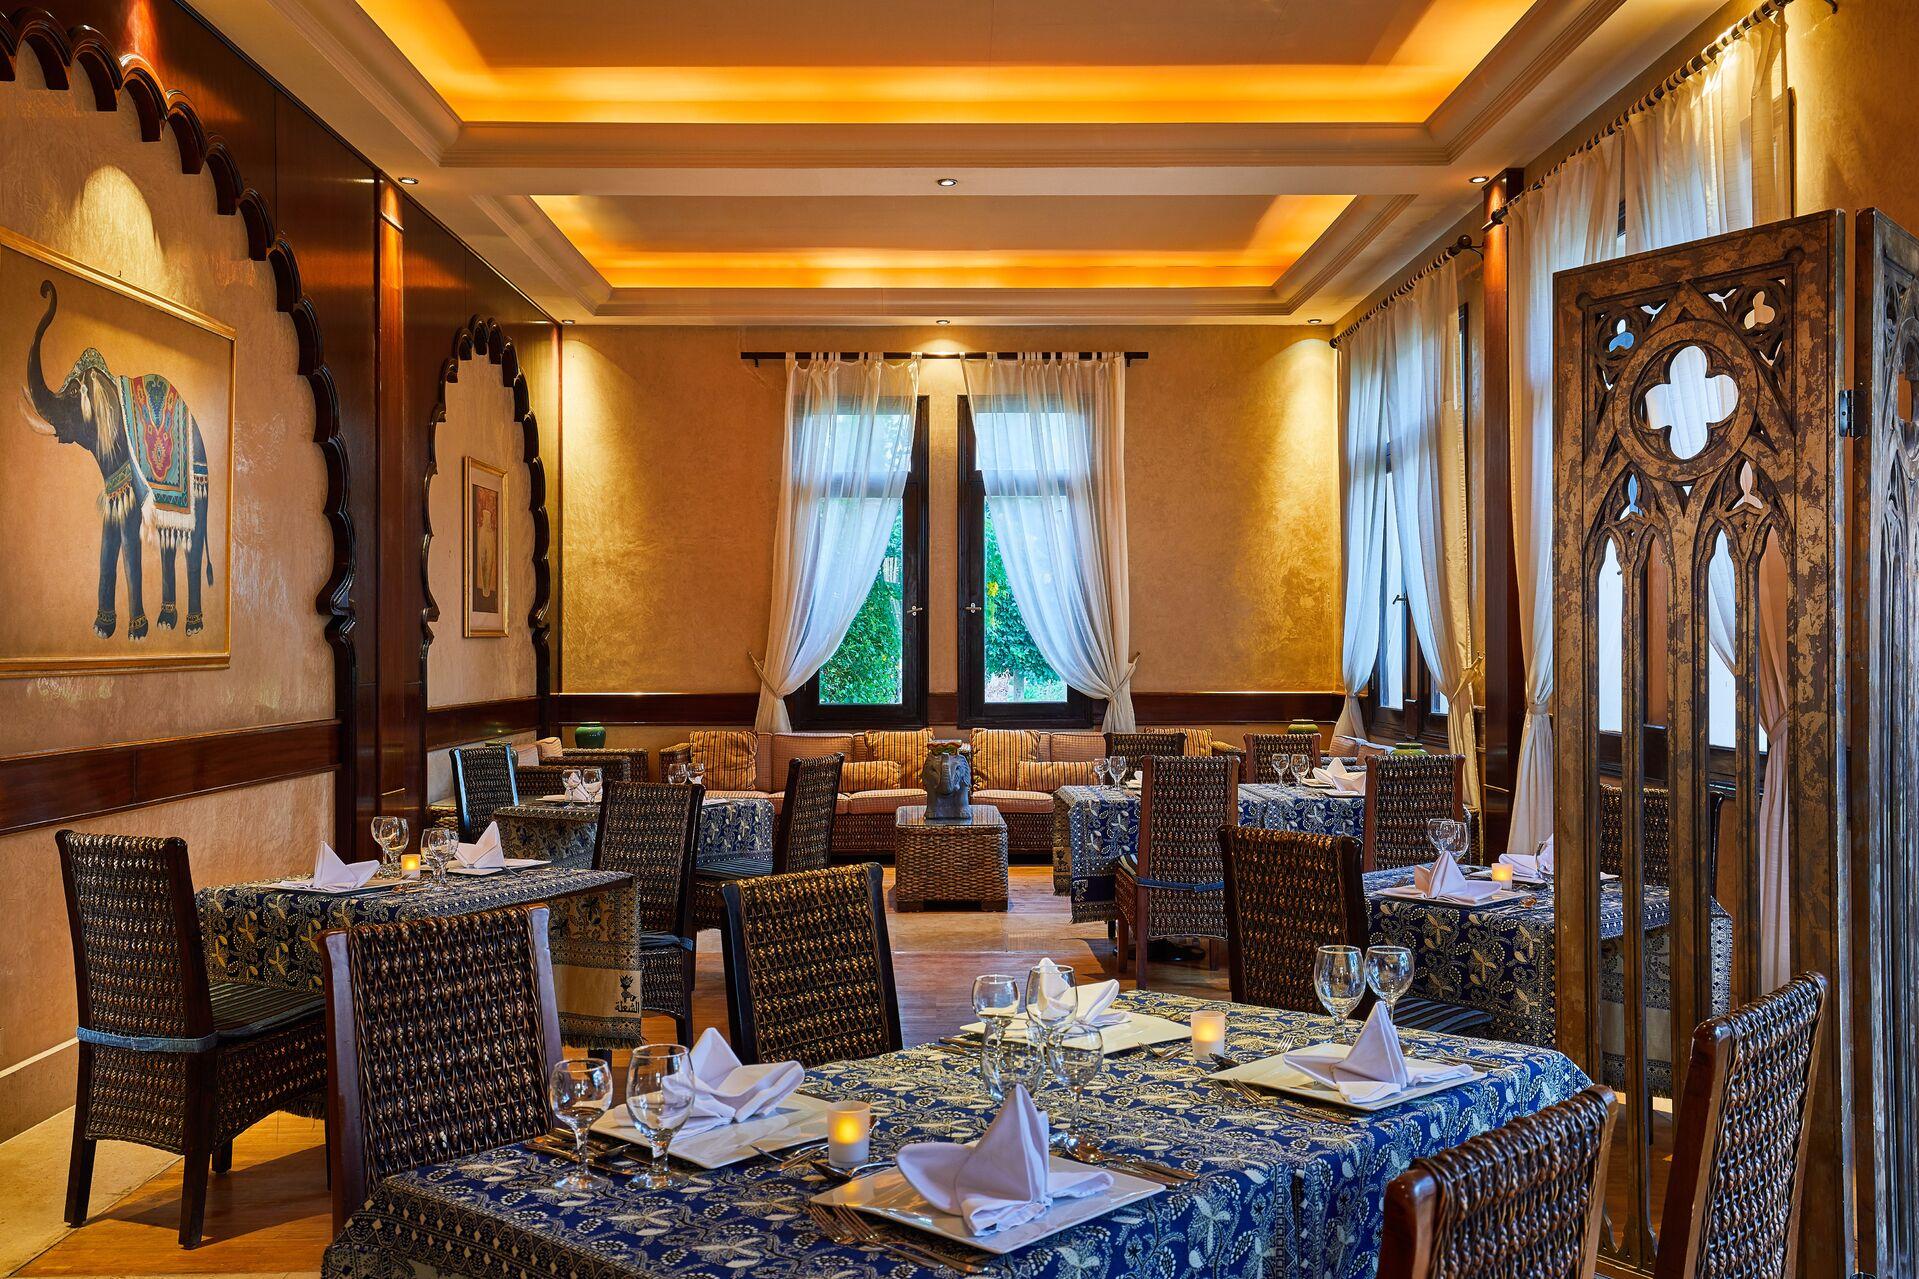 https://cms.satur.sk/data/imgs/tour_image/orig/amaya-restaurant-indian-cuisine-À-la-carte-restaurant-020118-1947526.jpg